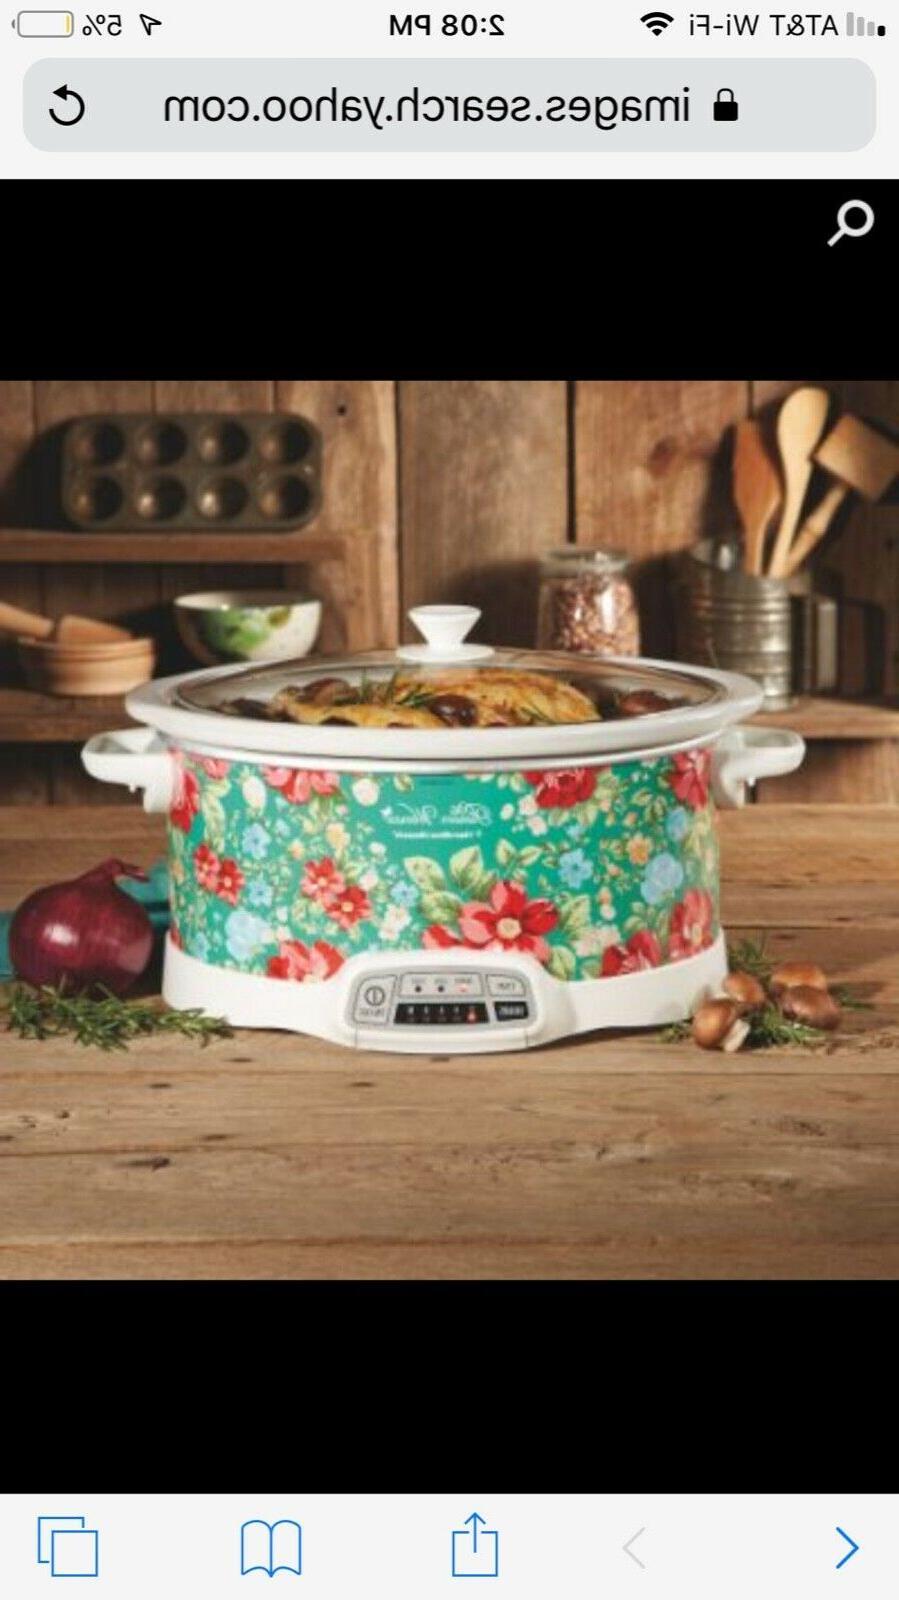 woman 7qt programable slow cooker